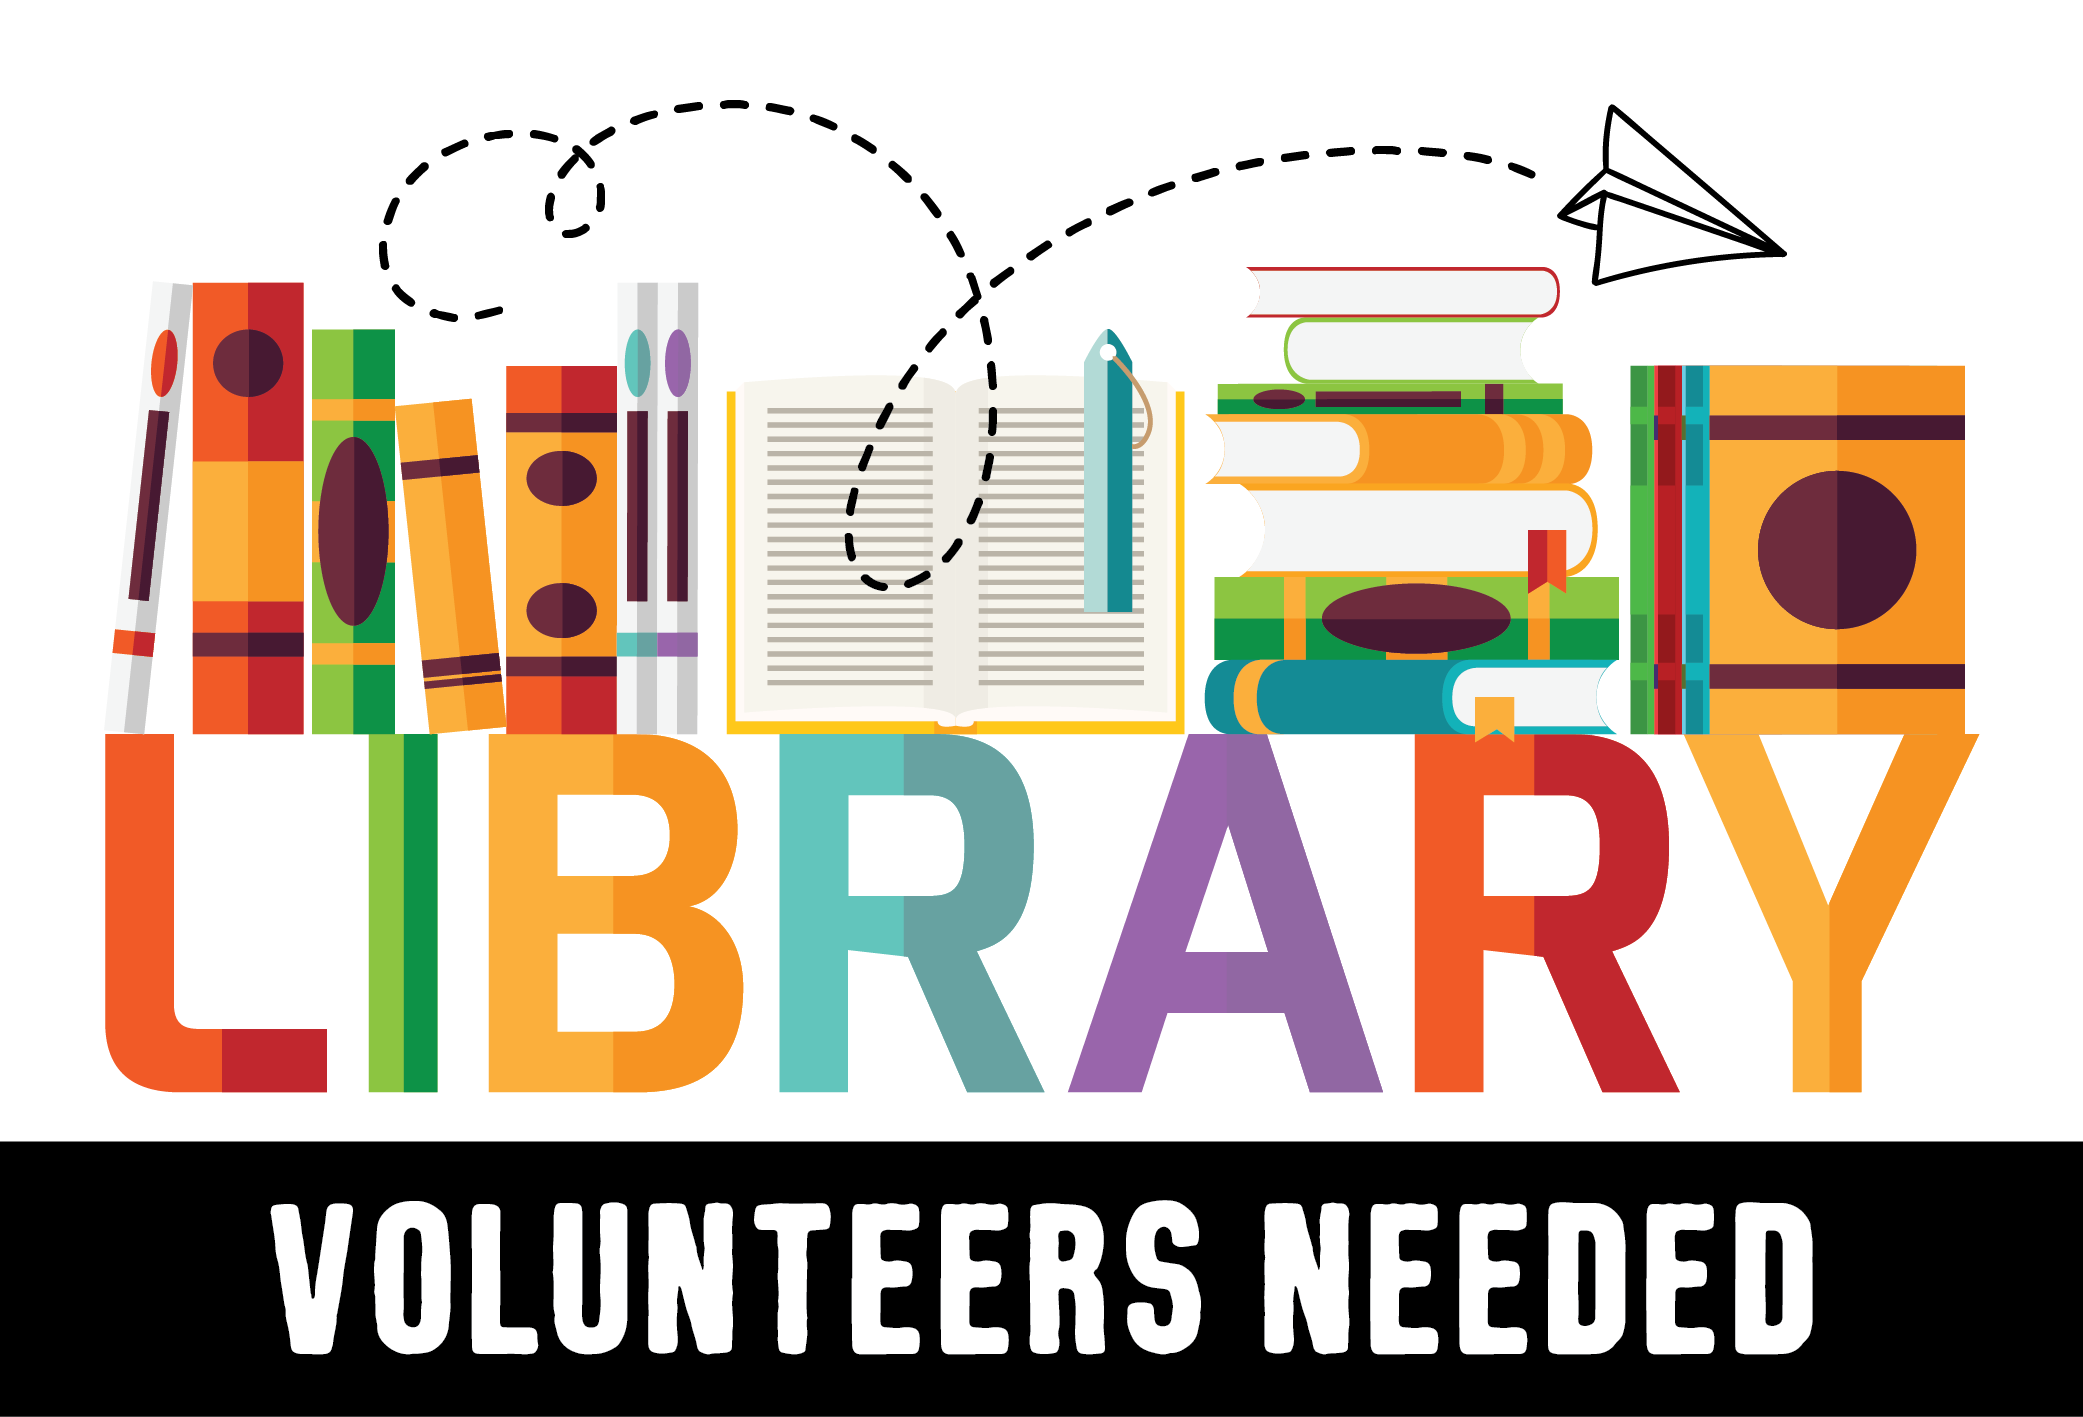 library volunteers needed image